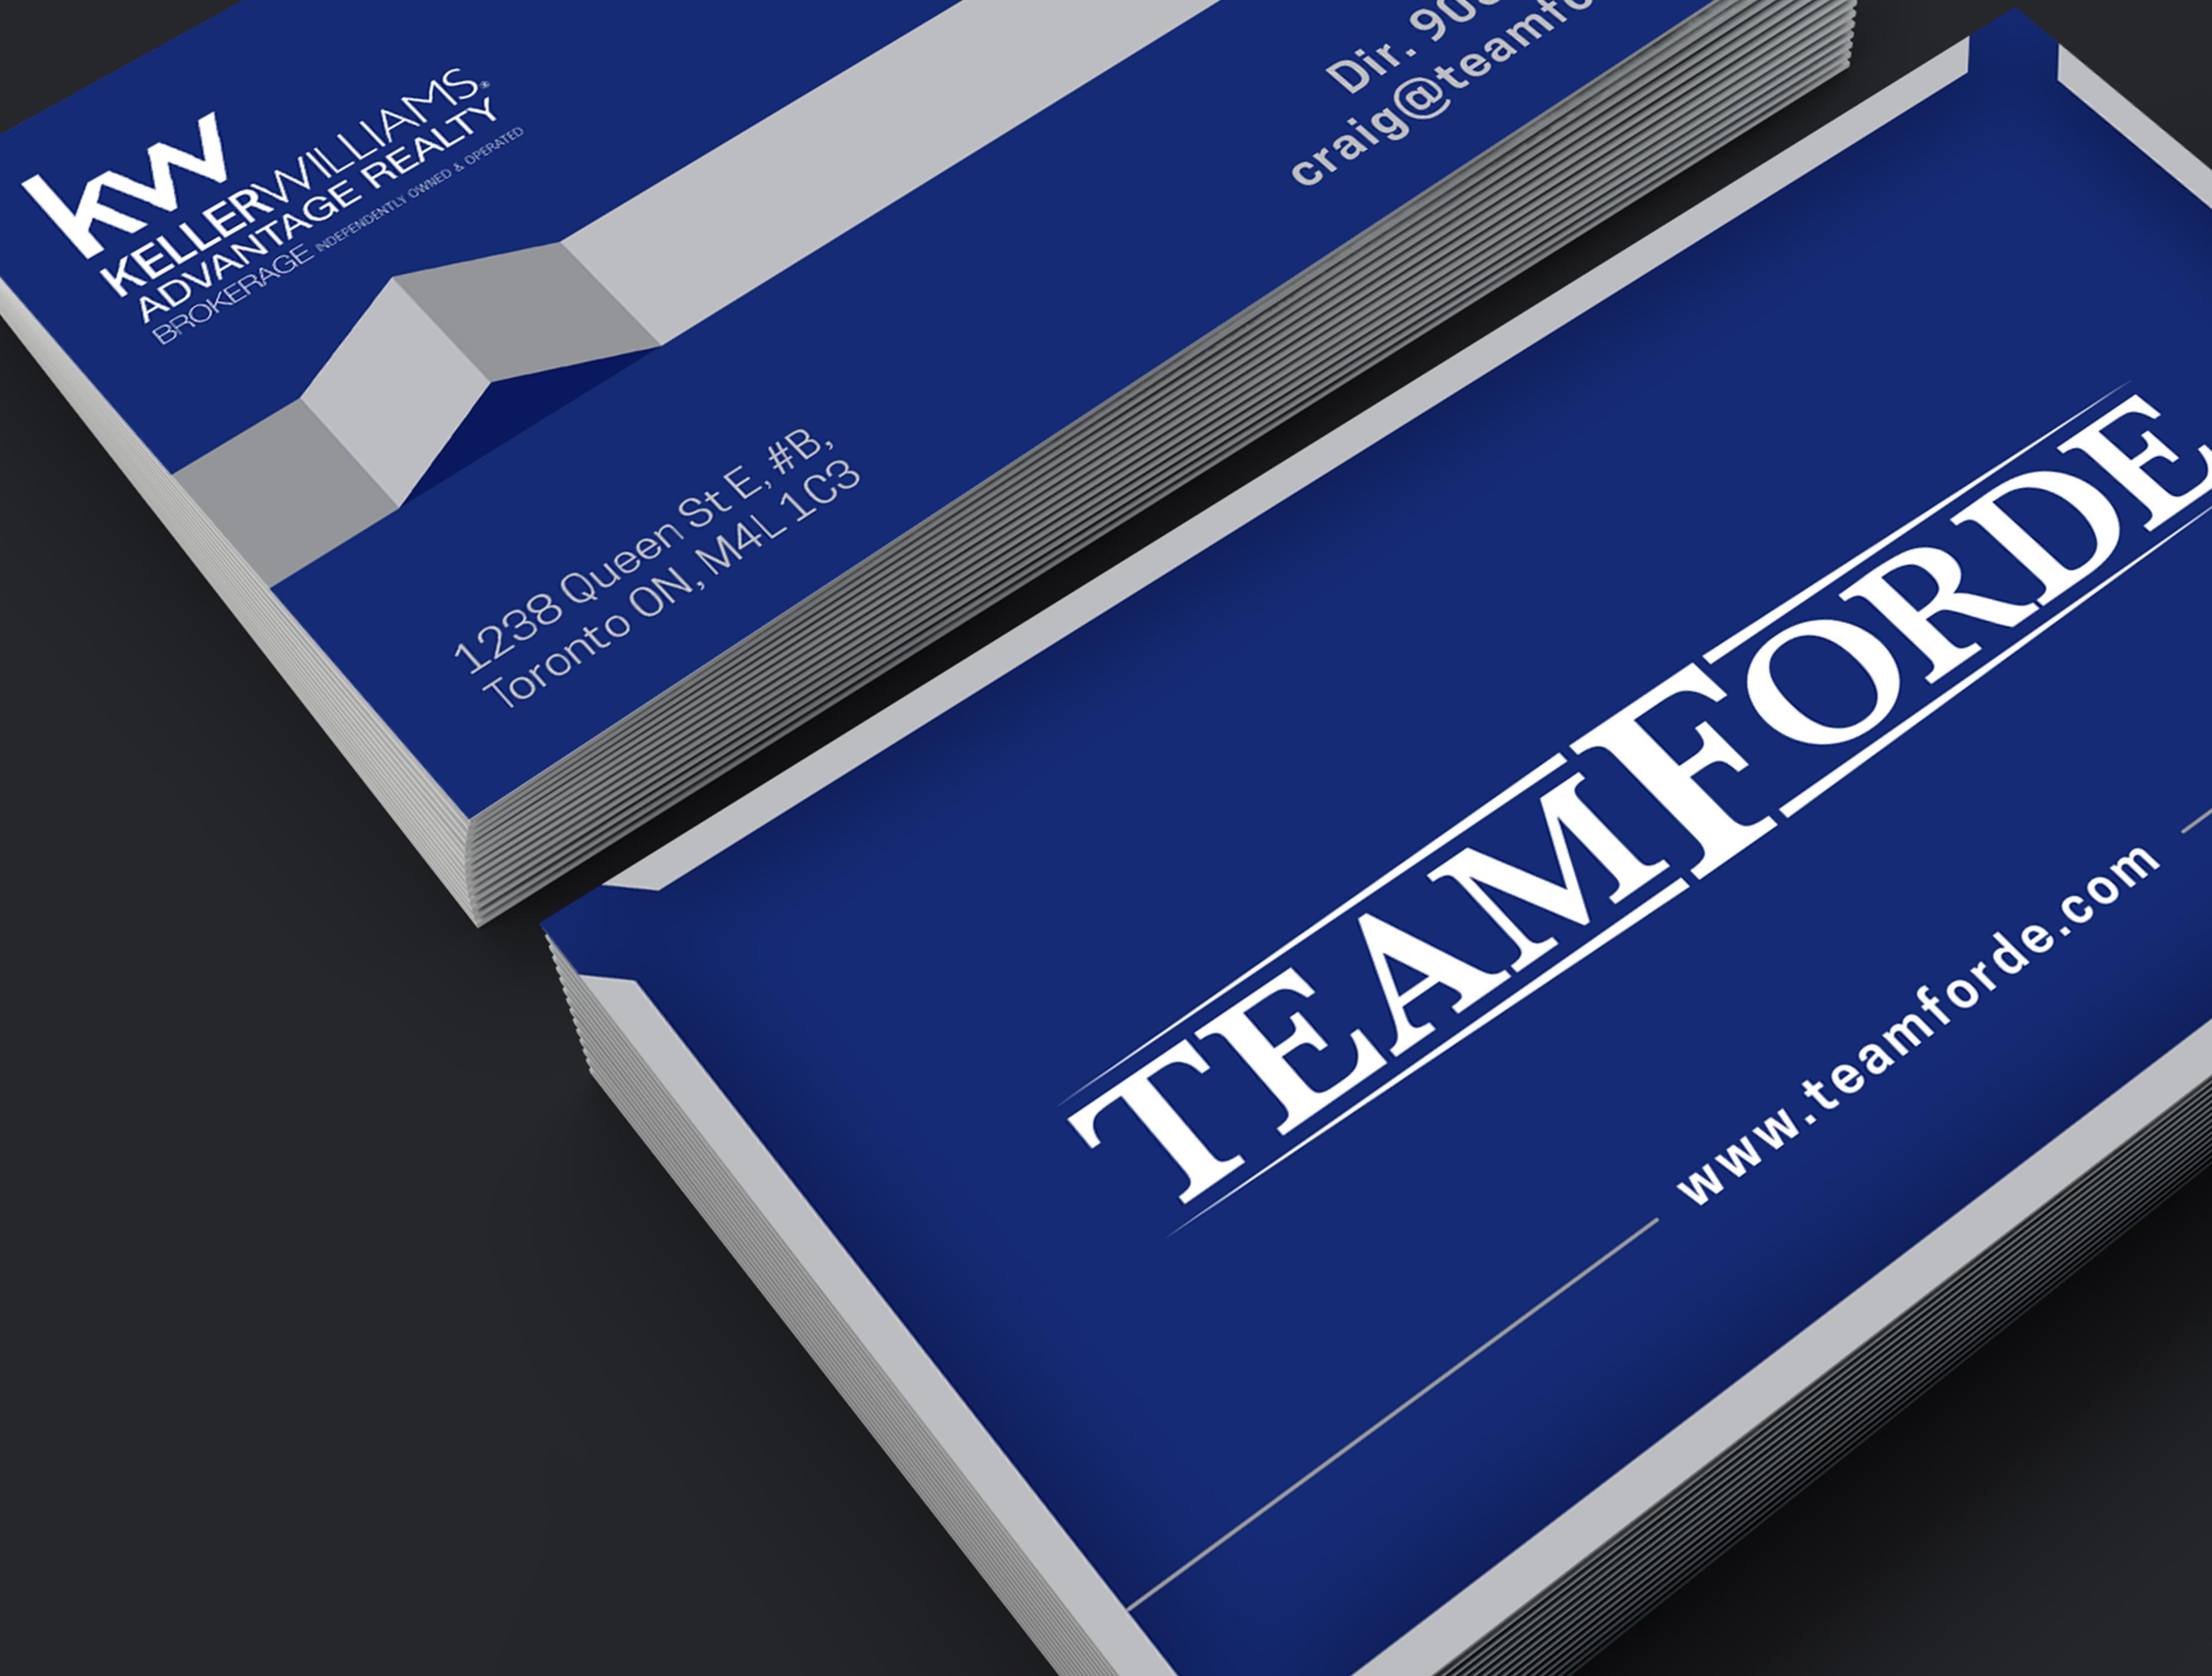 Team Forde